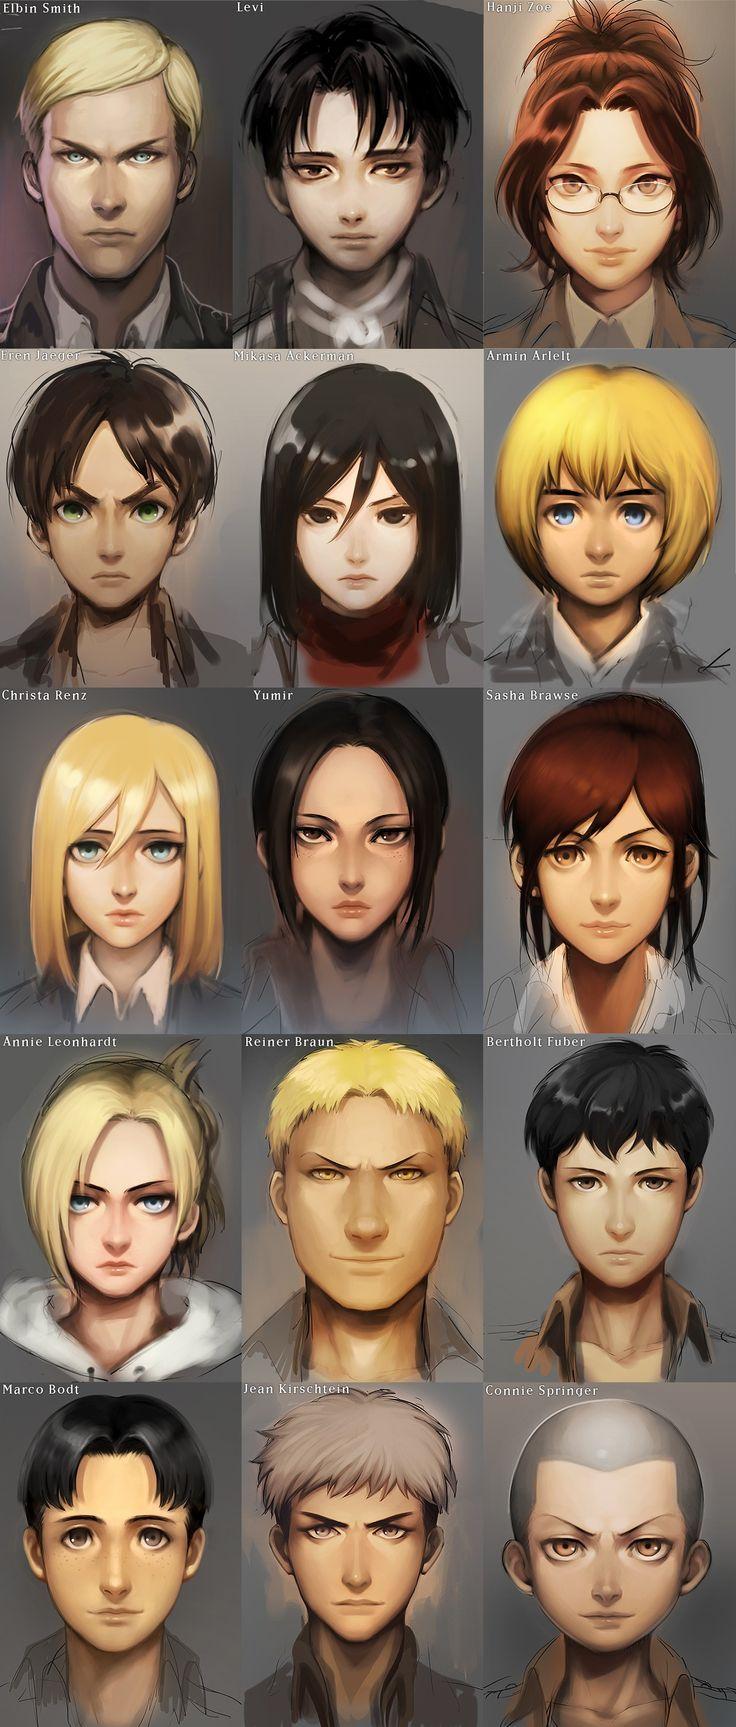 Personajes de Shingeki no Kyojin la mejor serie!♥